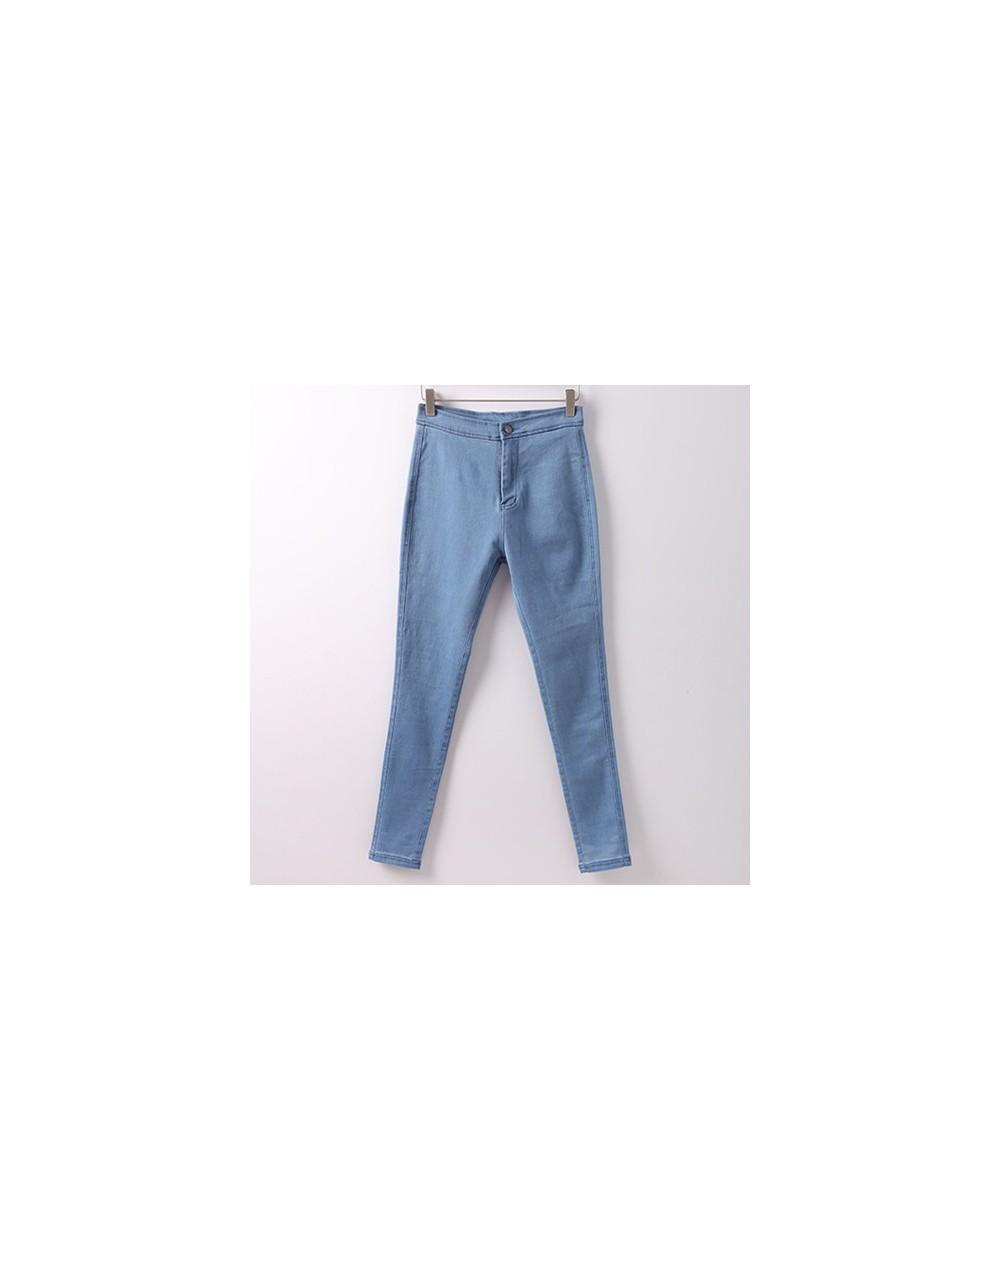 Skinny Jeans Woman Pantalon Femme Denim Pants Strech Womens Colored Tight Jeans With High Waist Women's Jeans High Waist - L...